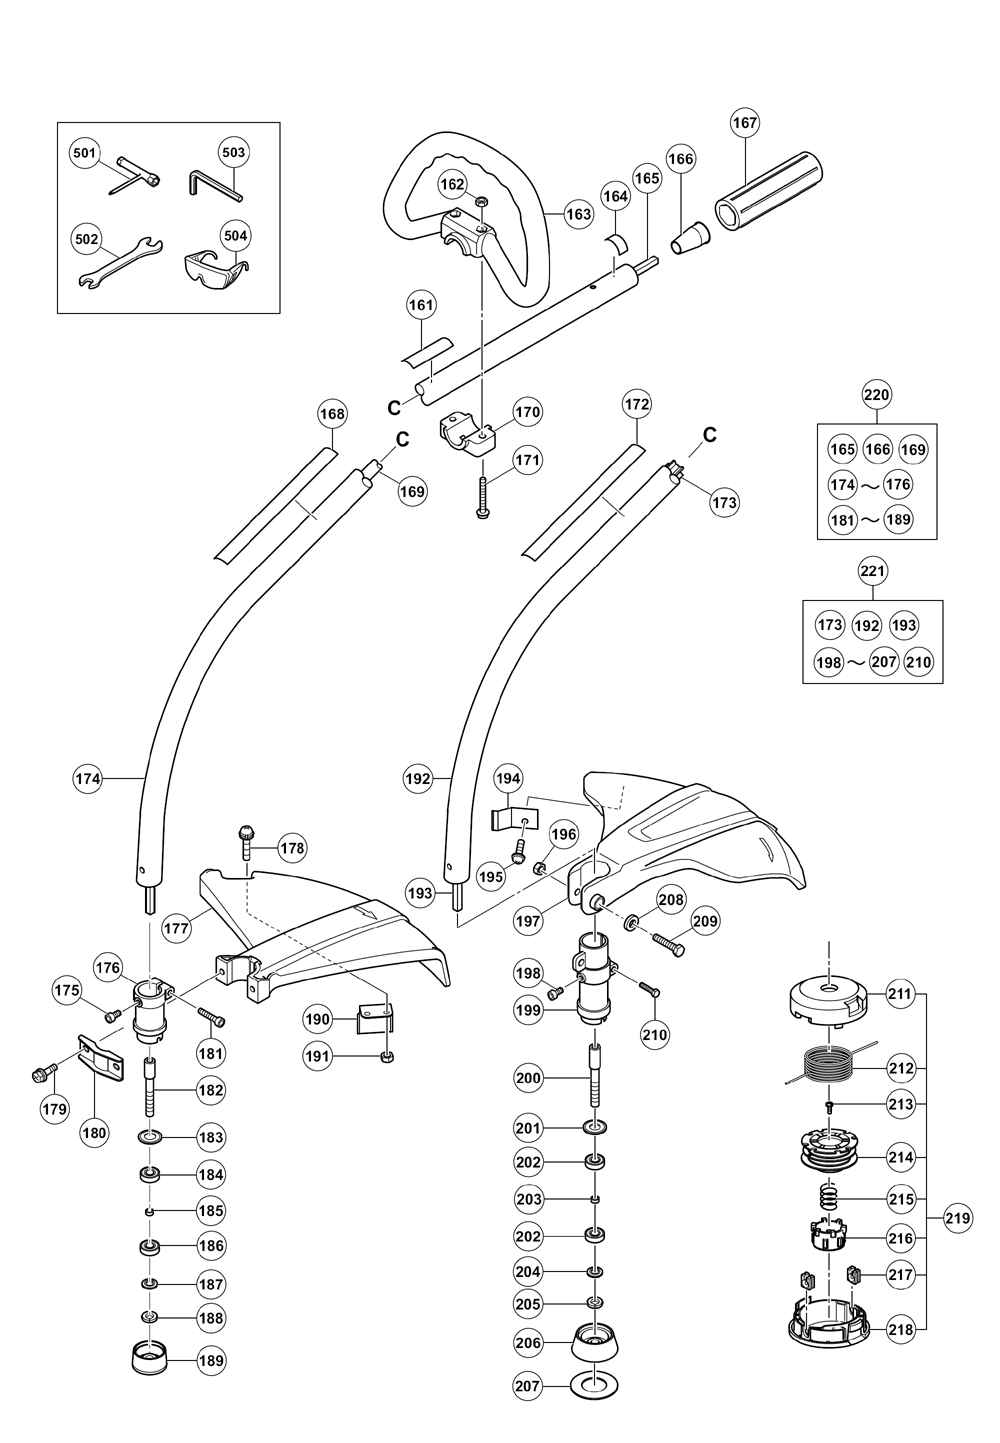 Hitachi-CG22EABSLP-Parts-2341-PBBreak Down